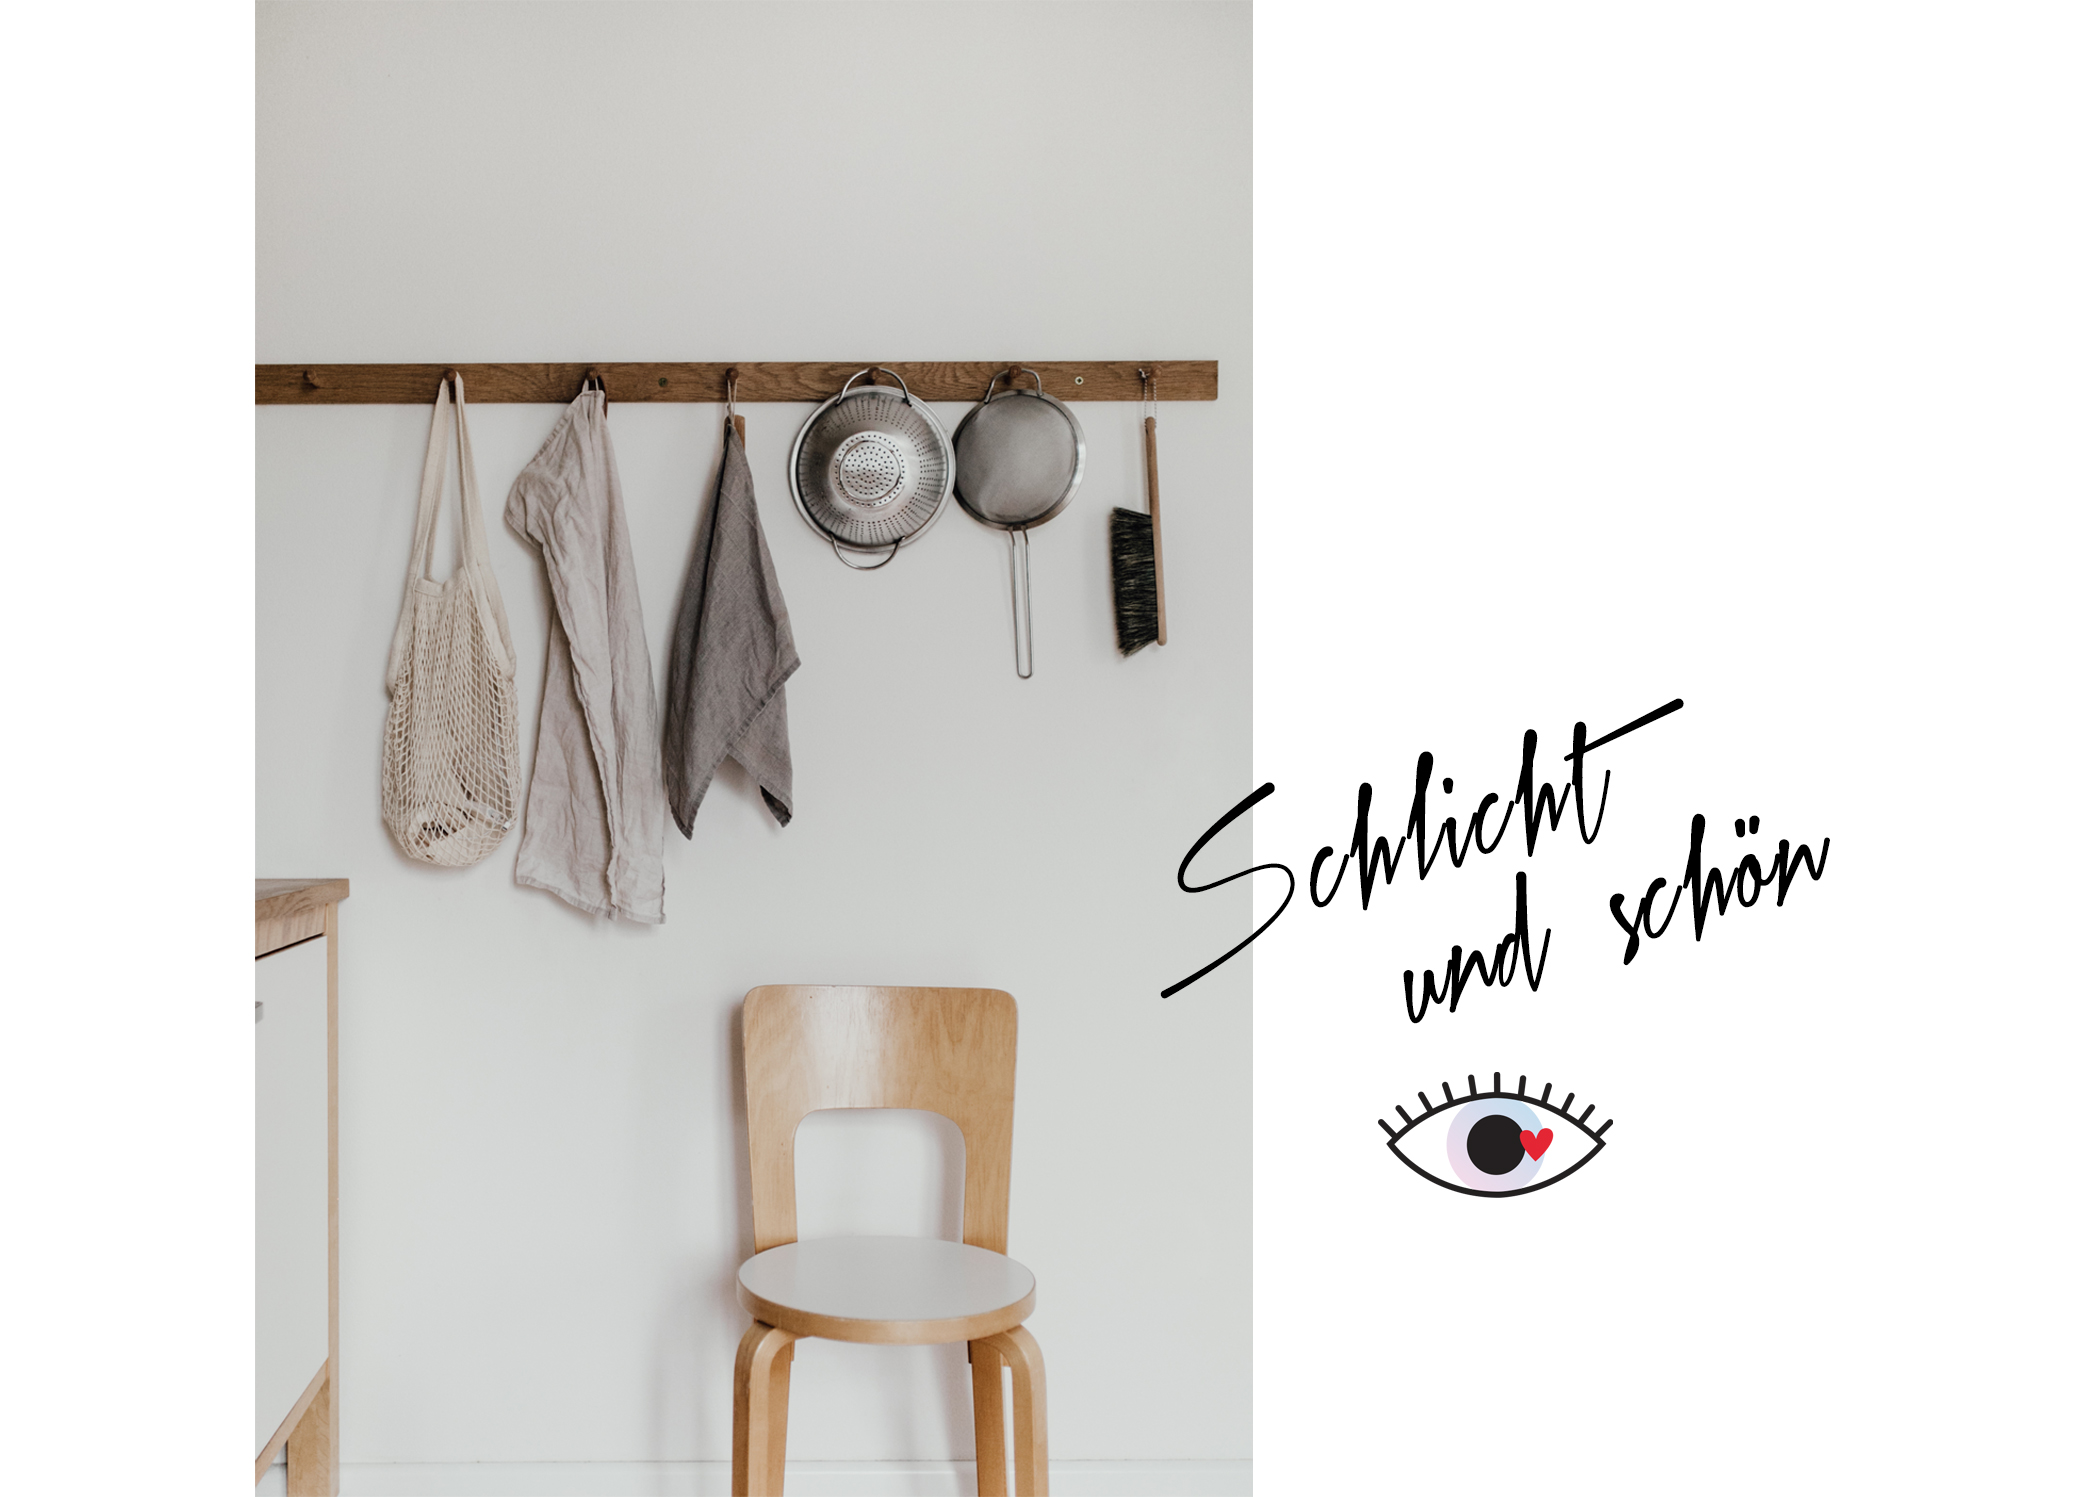 Swantje-und-frieda-homestory_022